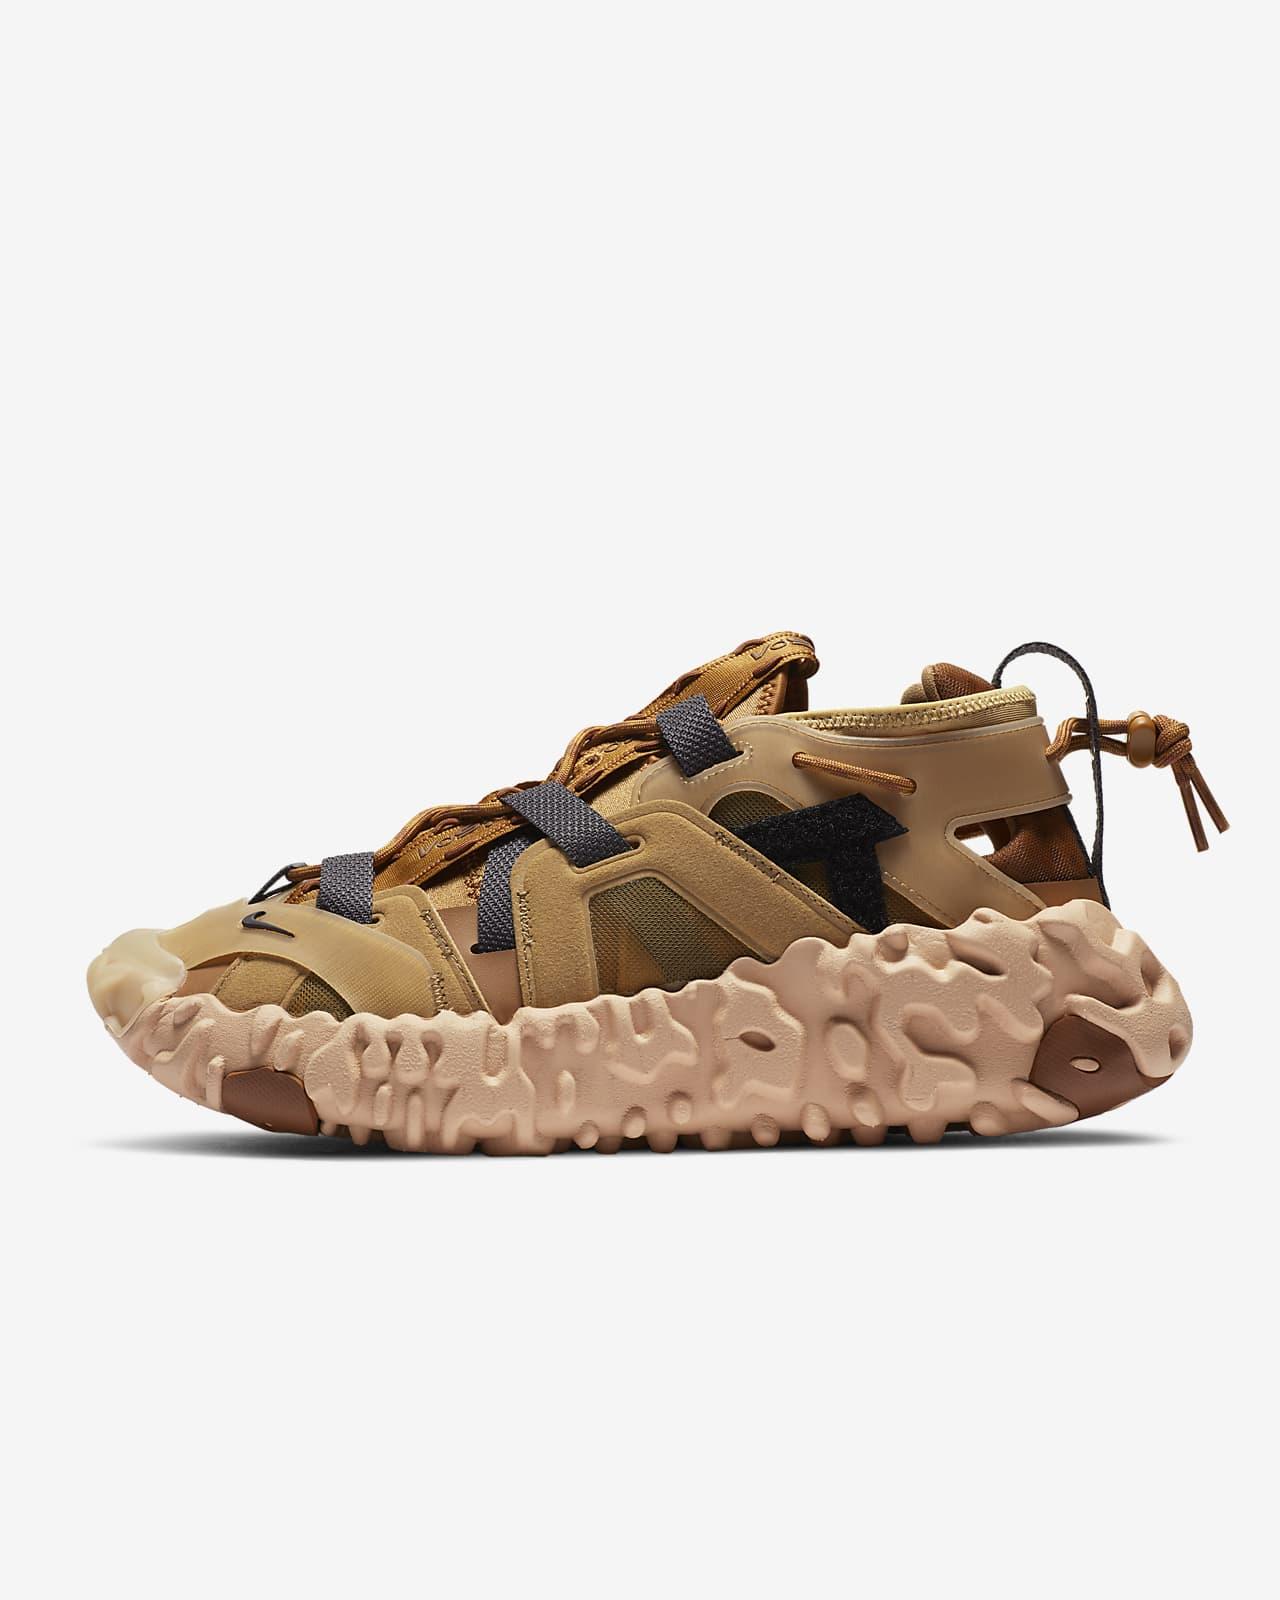 Nike ISPA OverReact Sandal